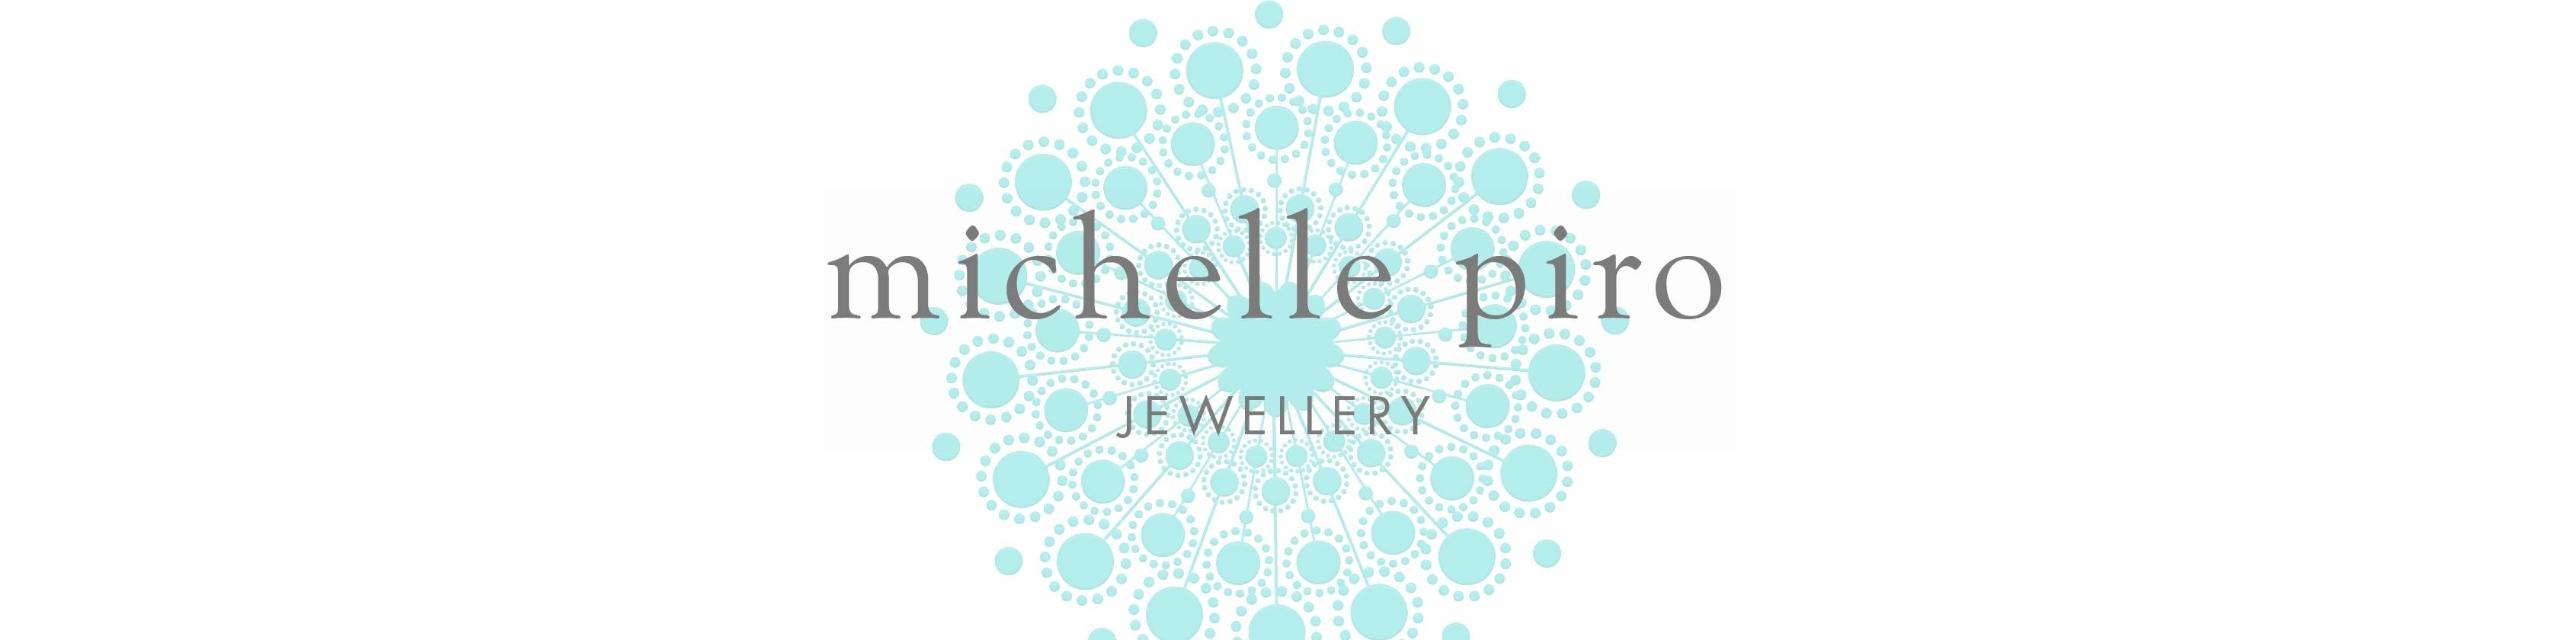 Michelle Piro Jewellery (@michellepirojewellery) Cover Image